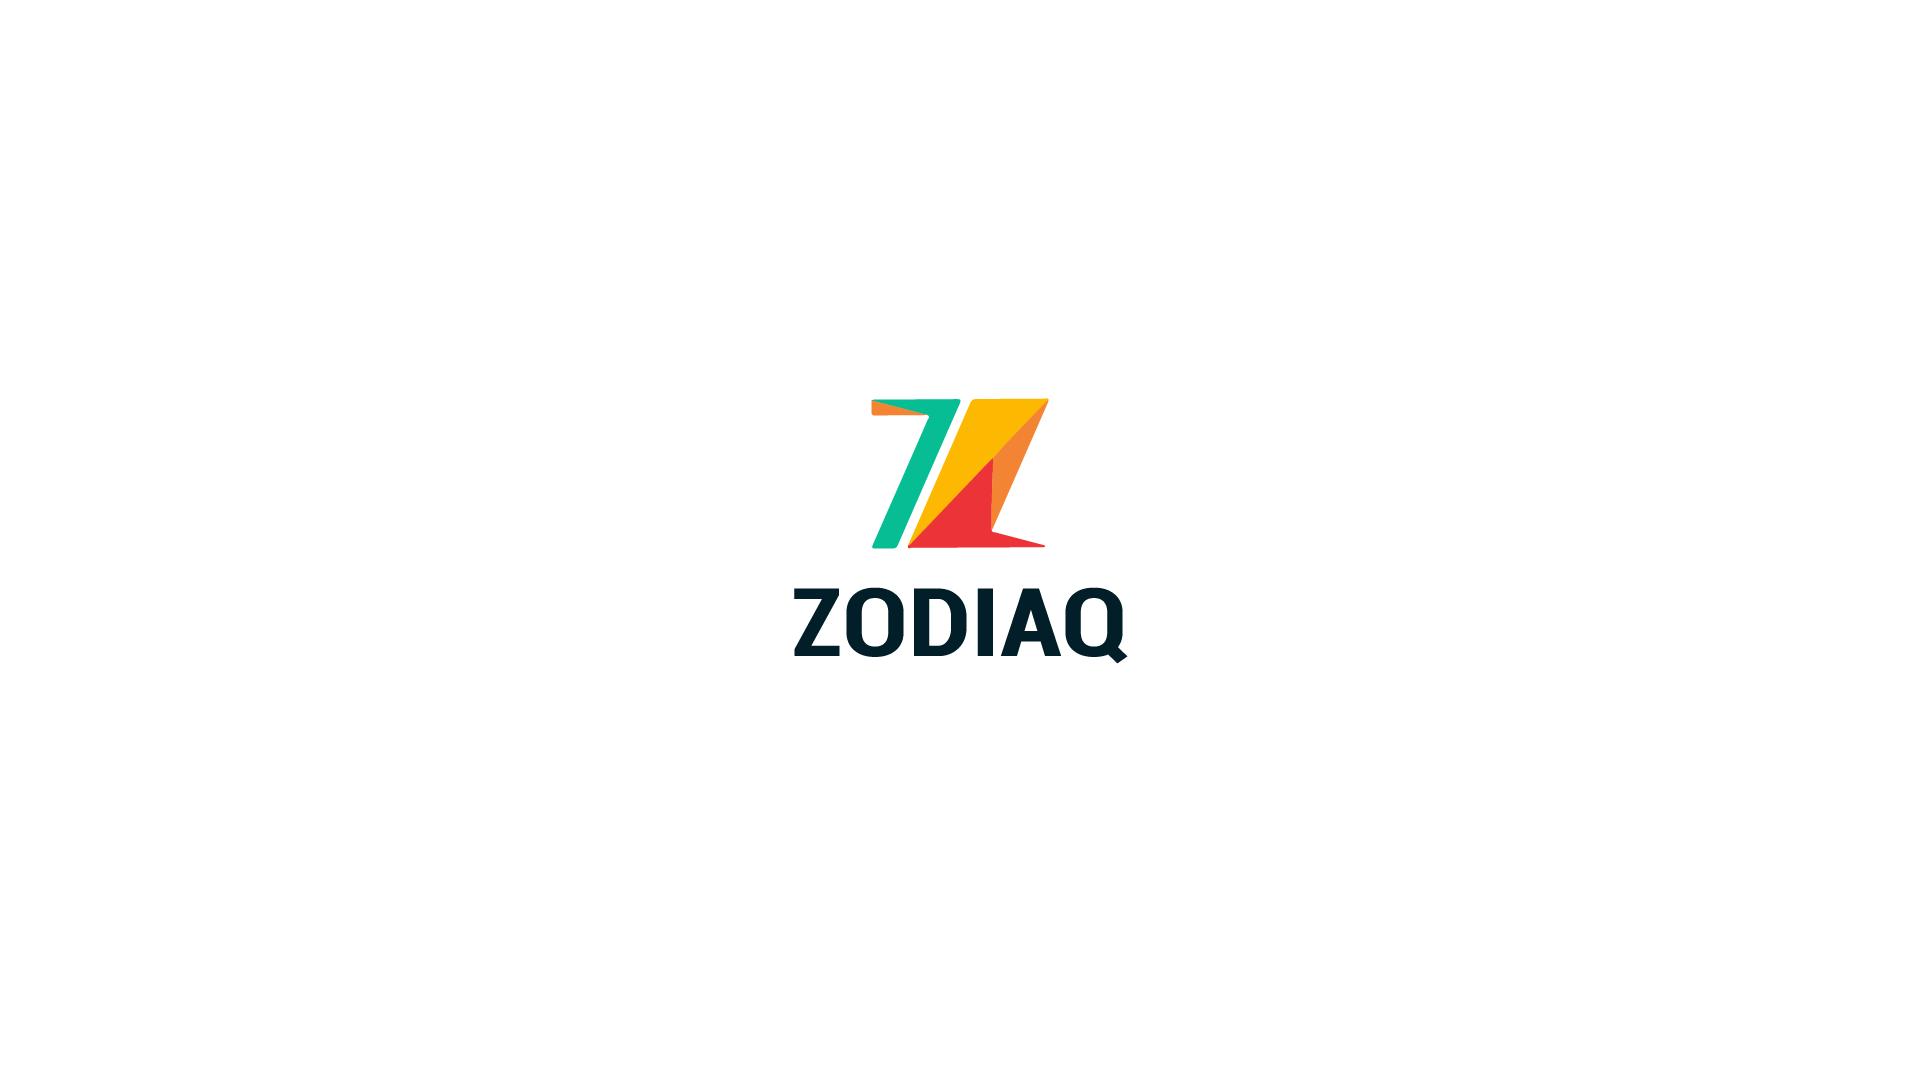 Разработка логотипа и основных элементов стиля фото f_27459902b68289cb.png